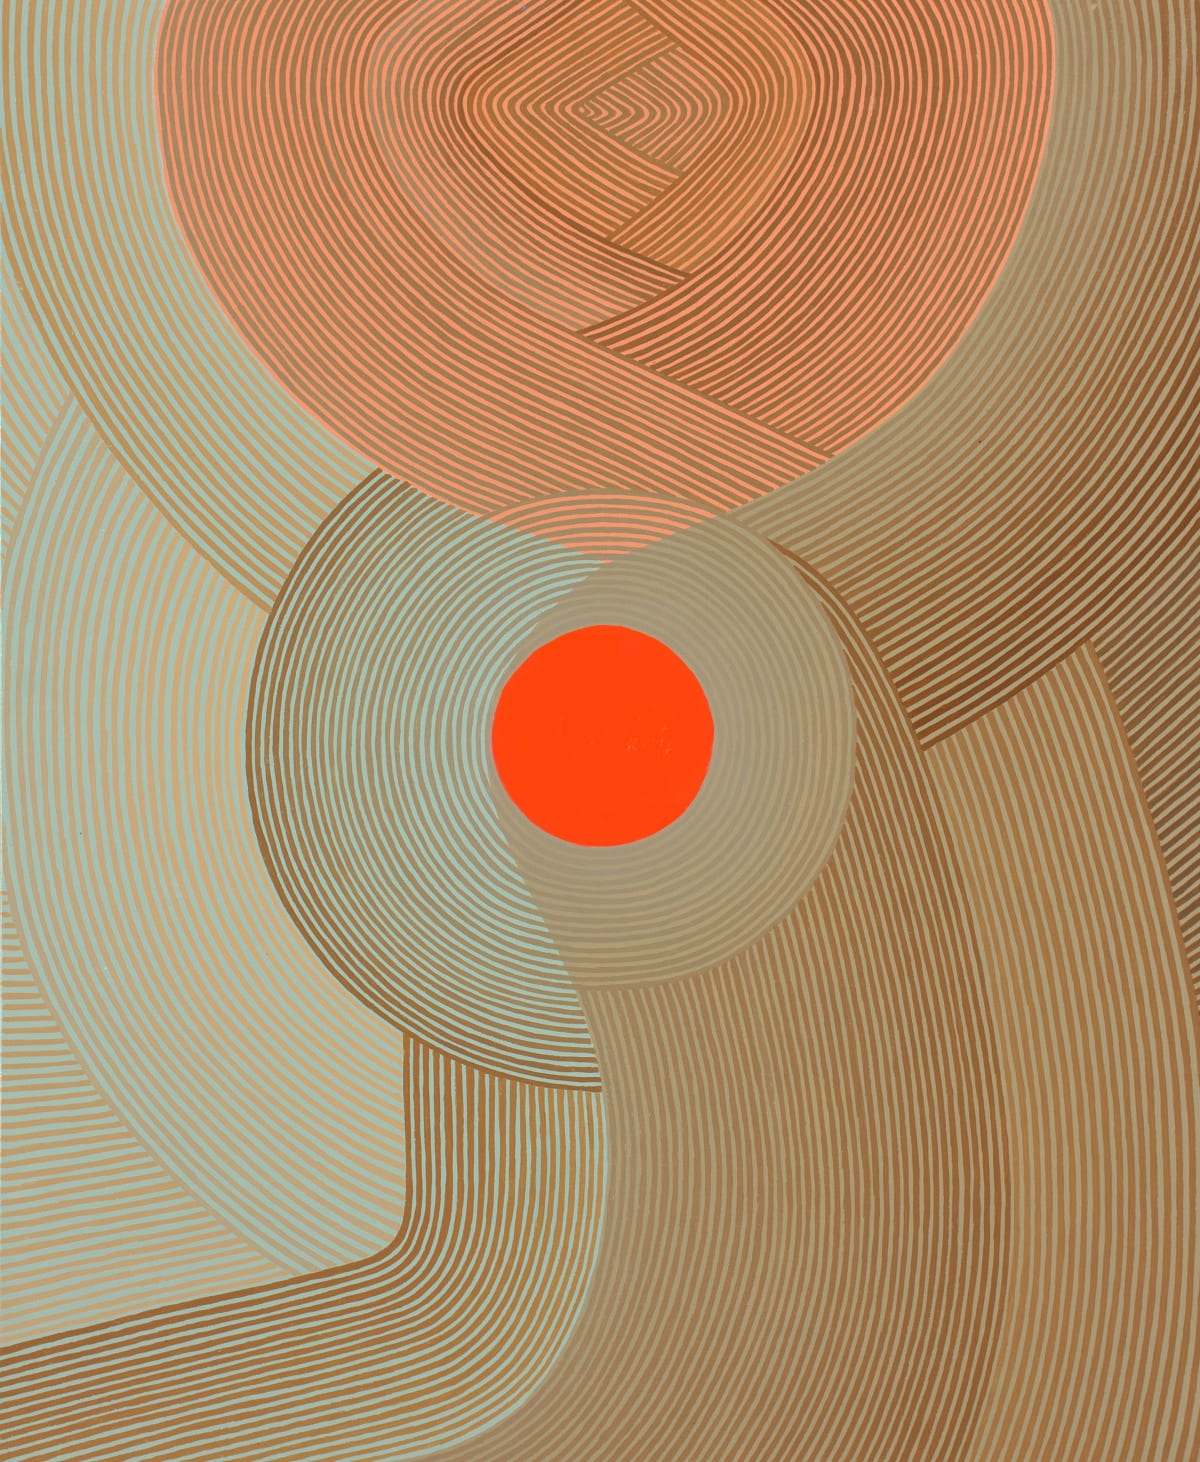 Jenny Kemp, Fly By, 2018